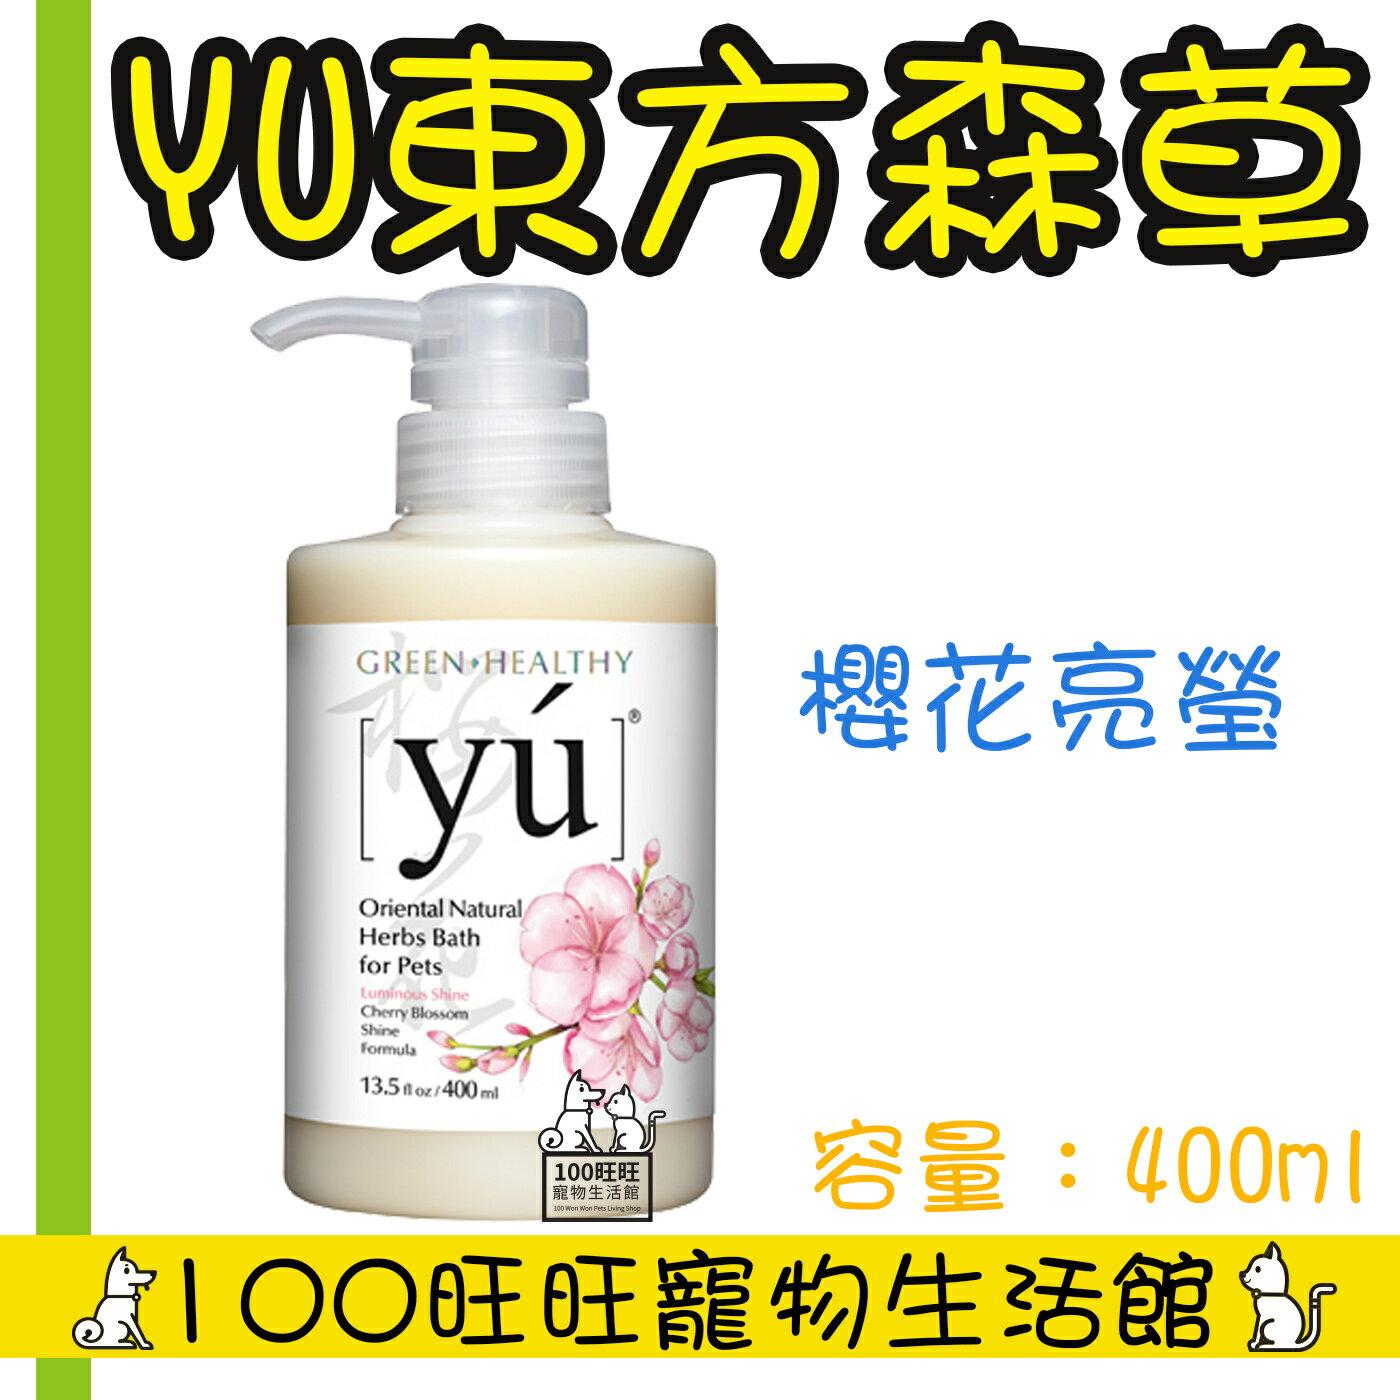 YU 東方森草寵物沐浴乳 含有機認證成分 櫻花亮瑩配方 400ml 寵物洗毛精